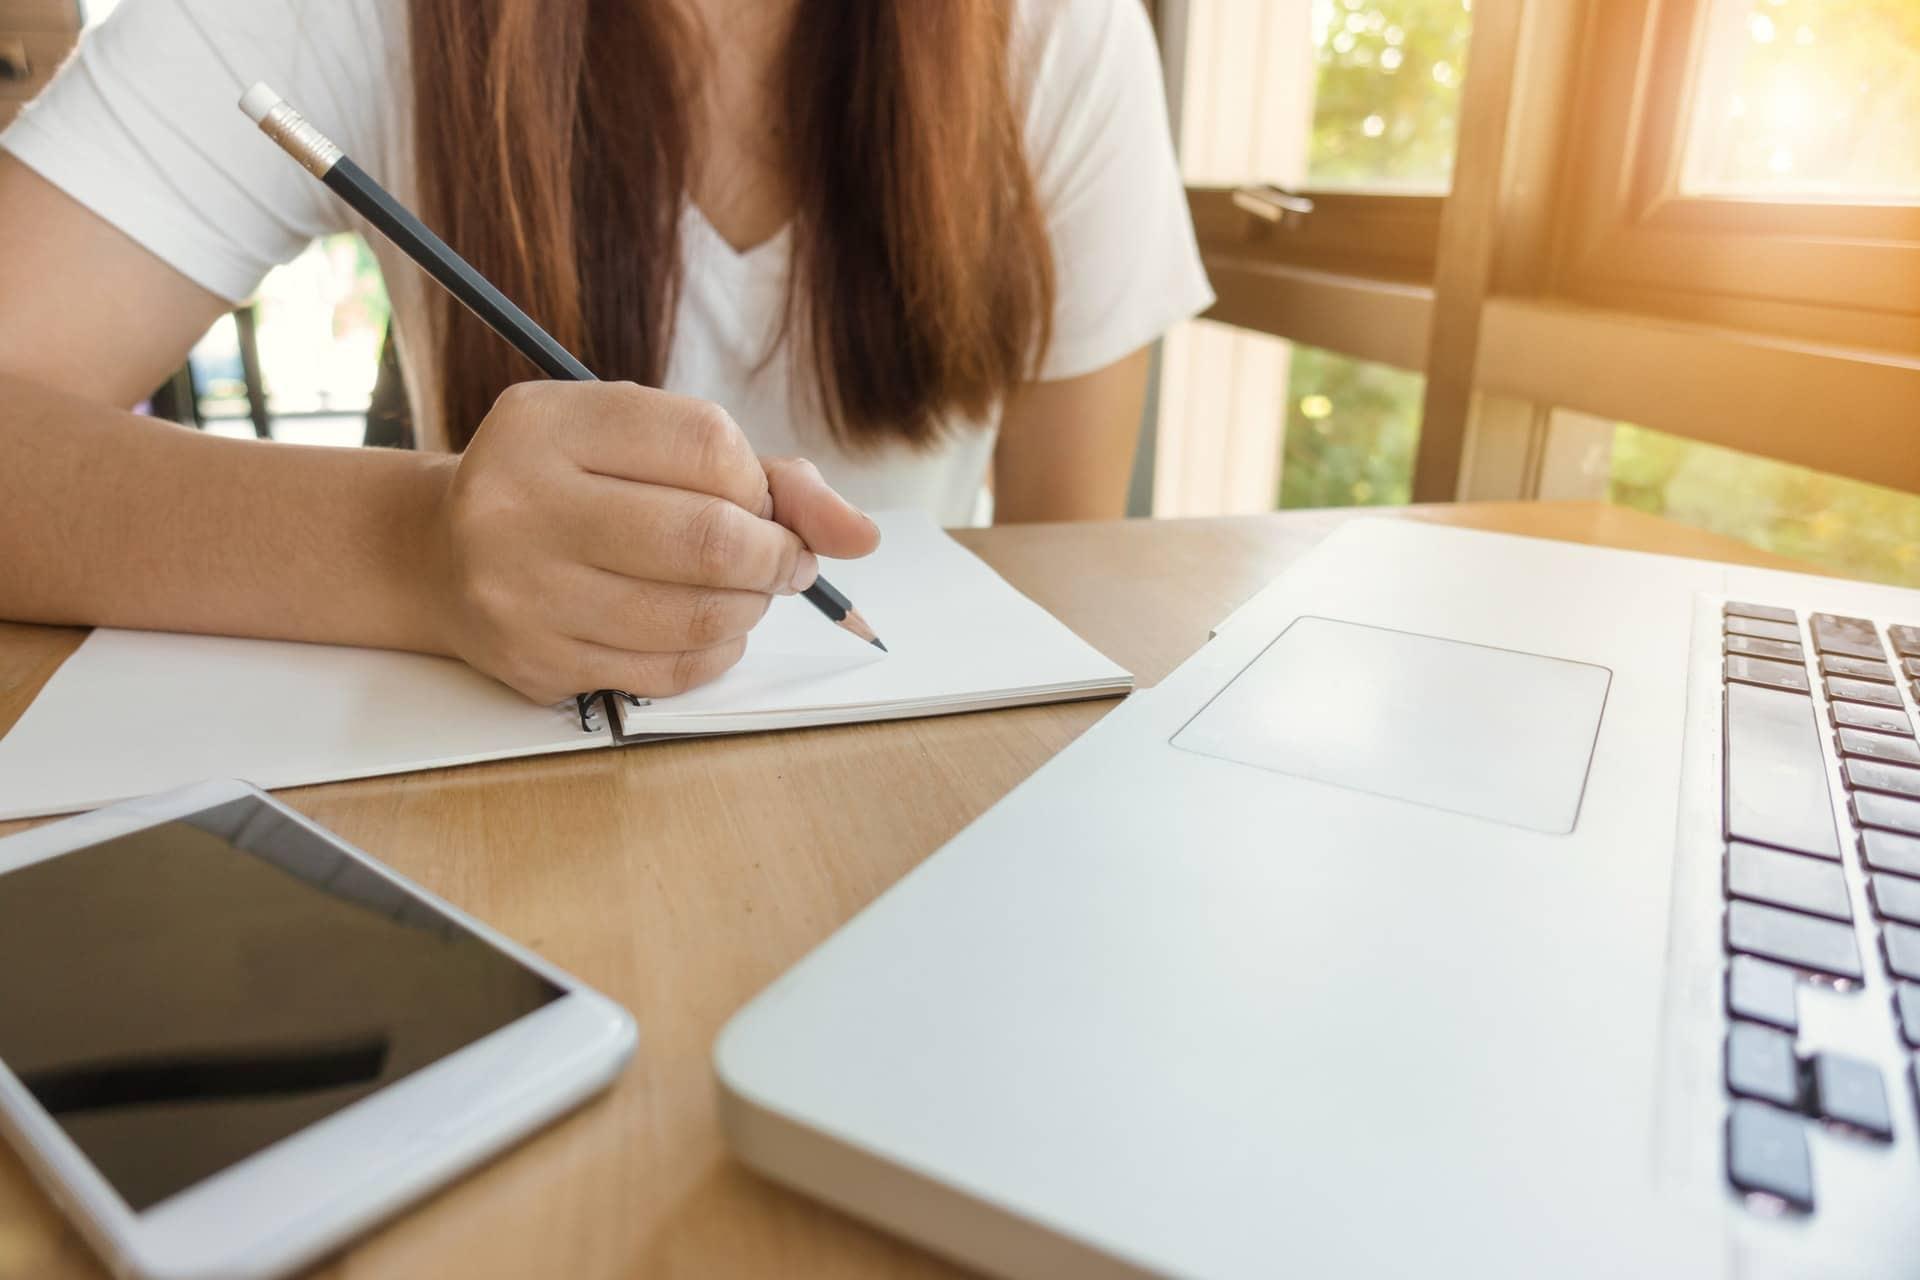 Student working on applying to school